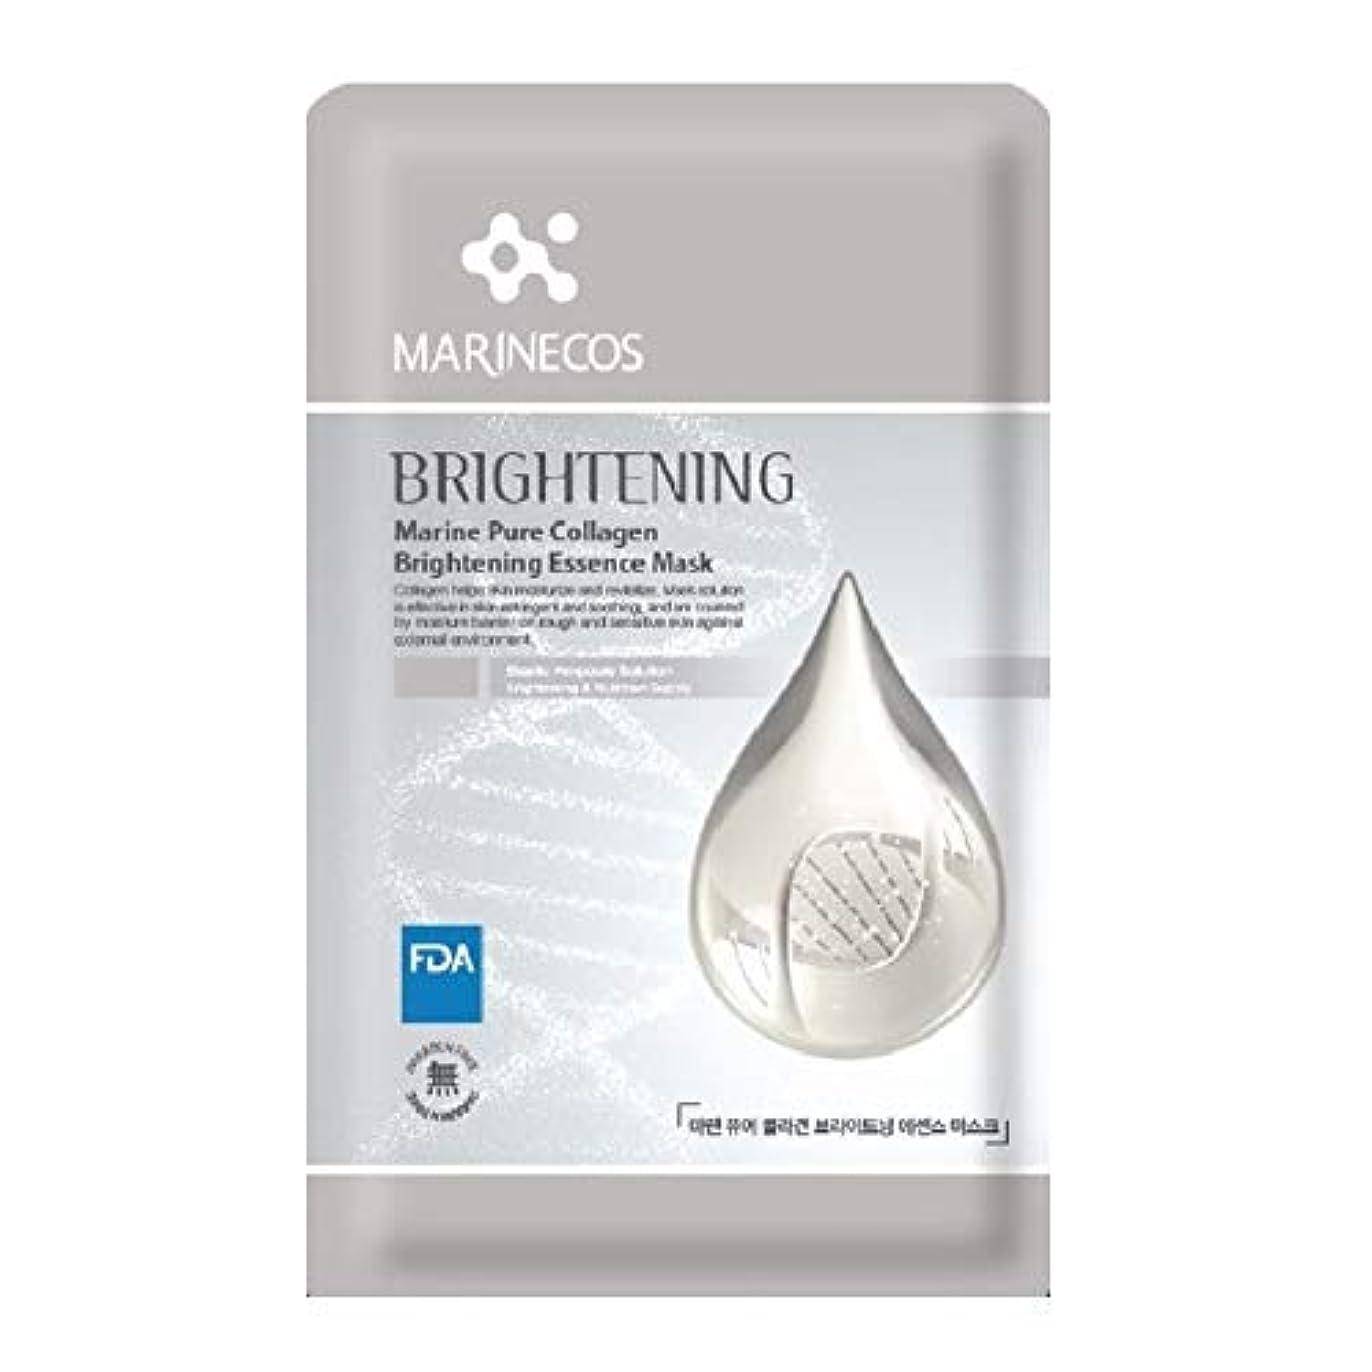 Korea, Beauty, Marine Pure Collagen Brightening Essence Mask 10 Sheets 1 Case 韓国ネーチャー コスメ ビューティー 韓国マスクシート